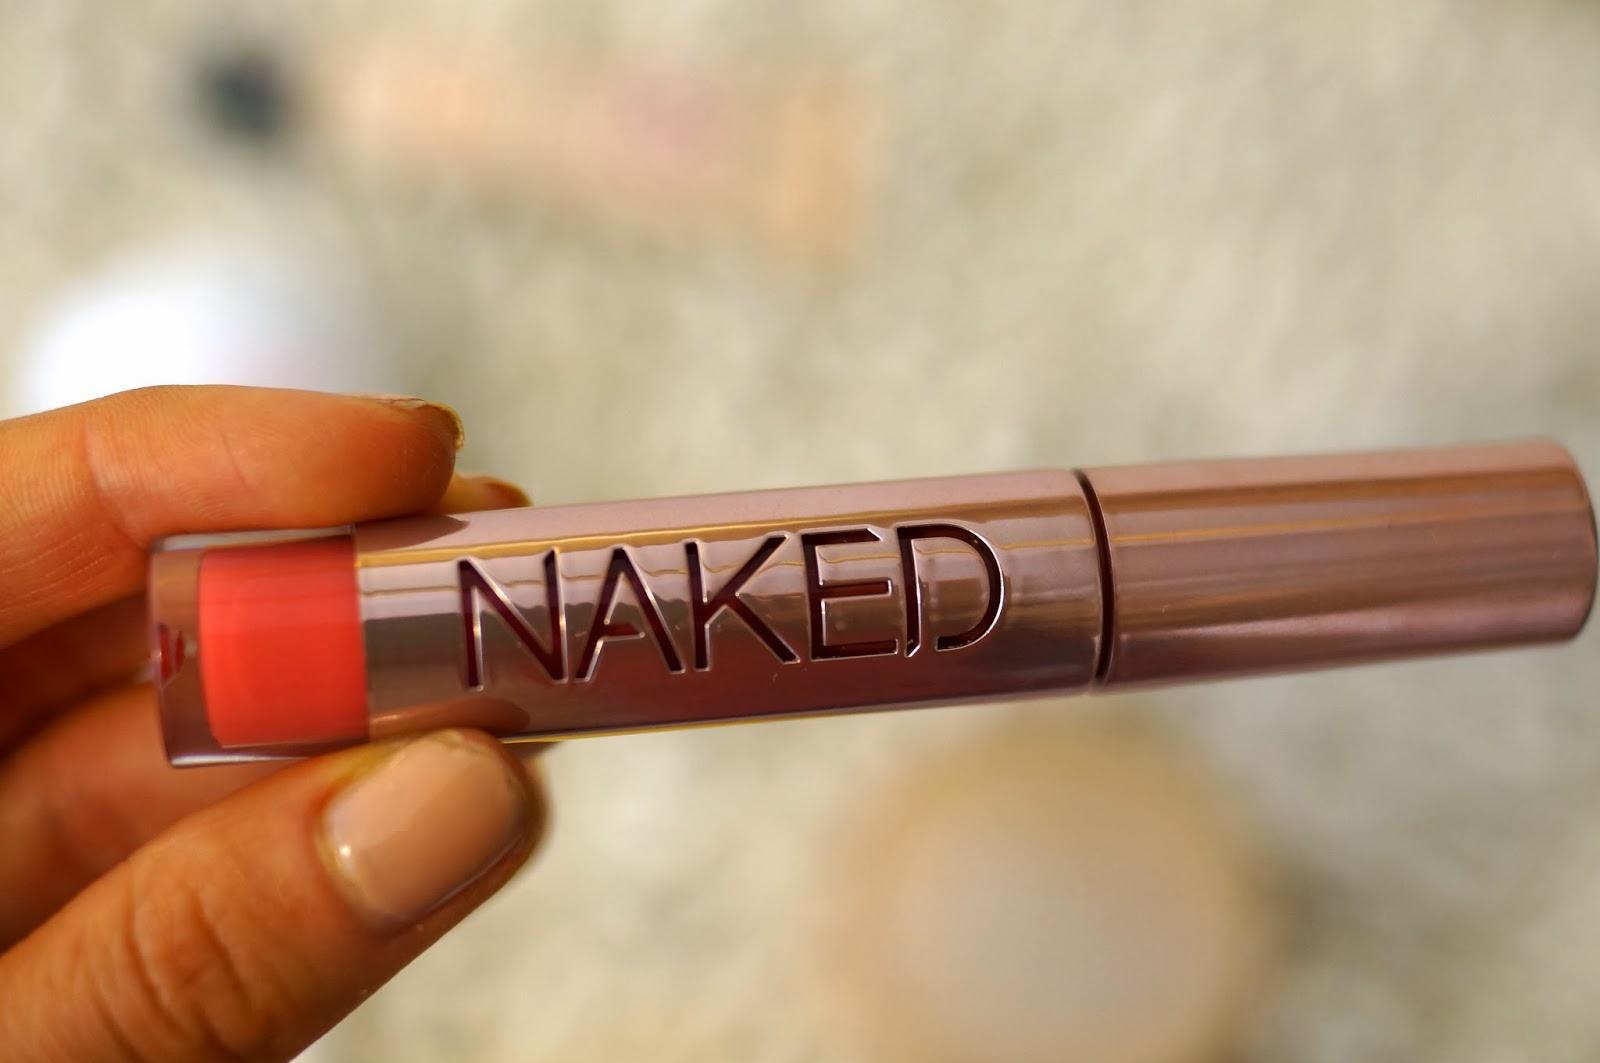 Urban Decay Naked Lipgloss in Streak